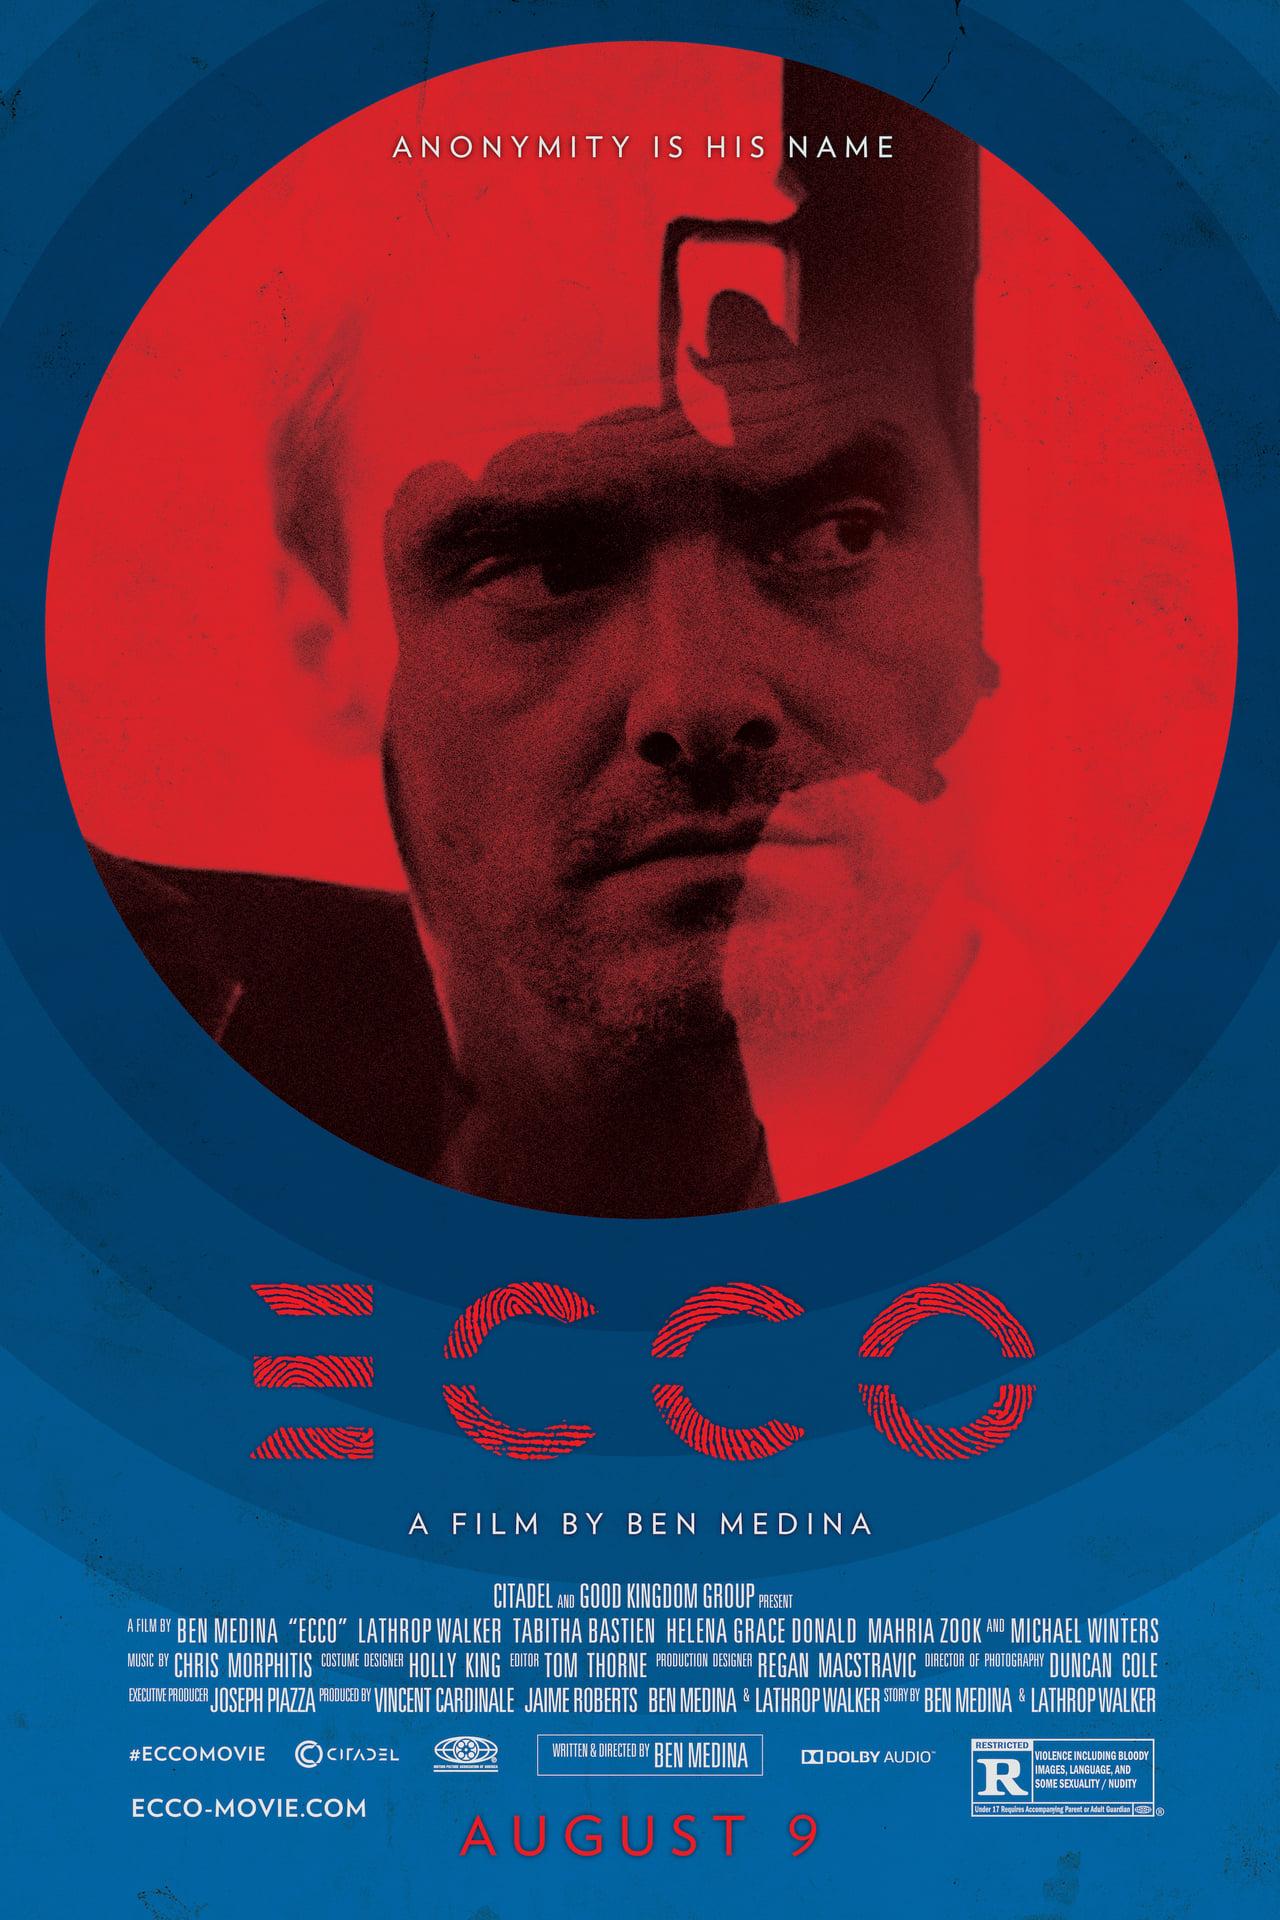 ECCO poster